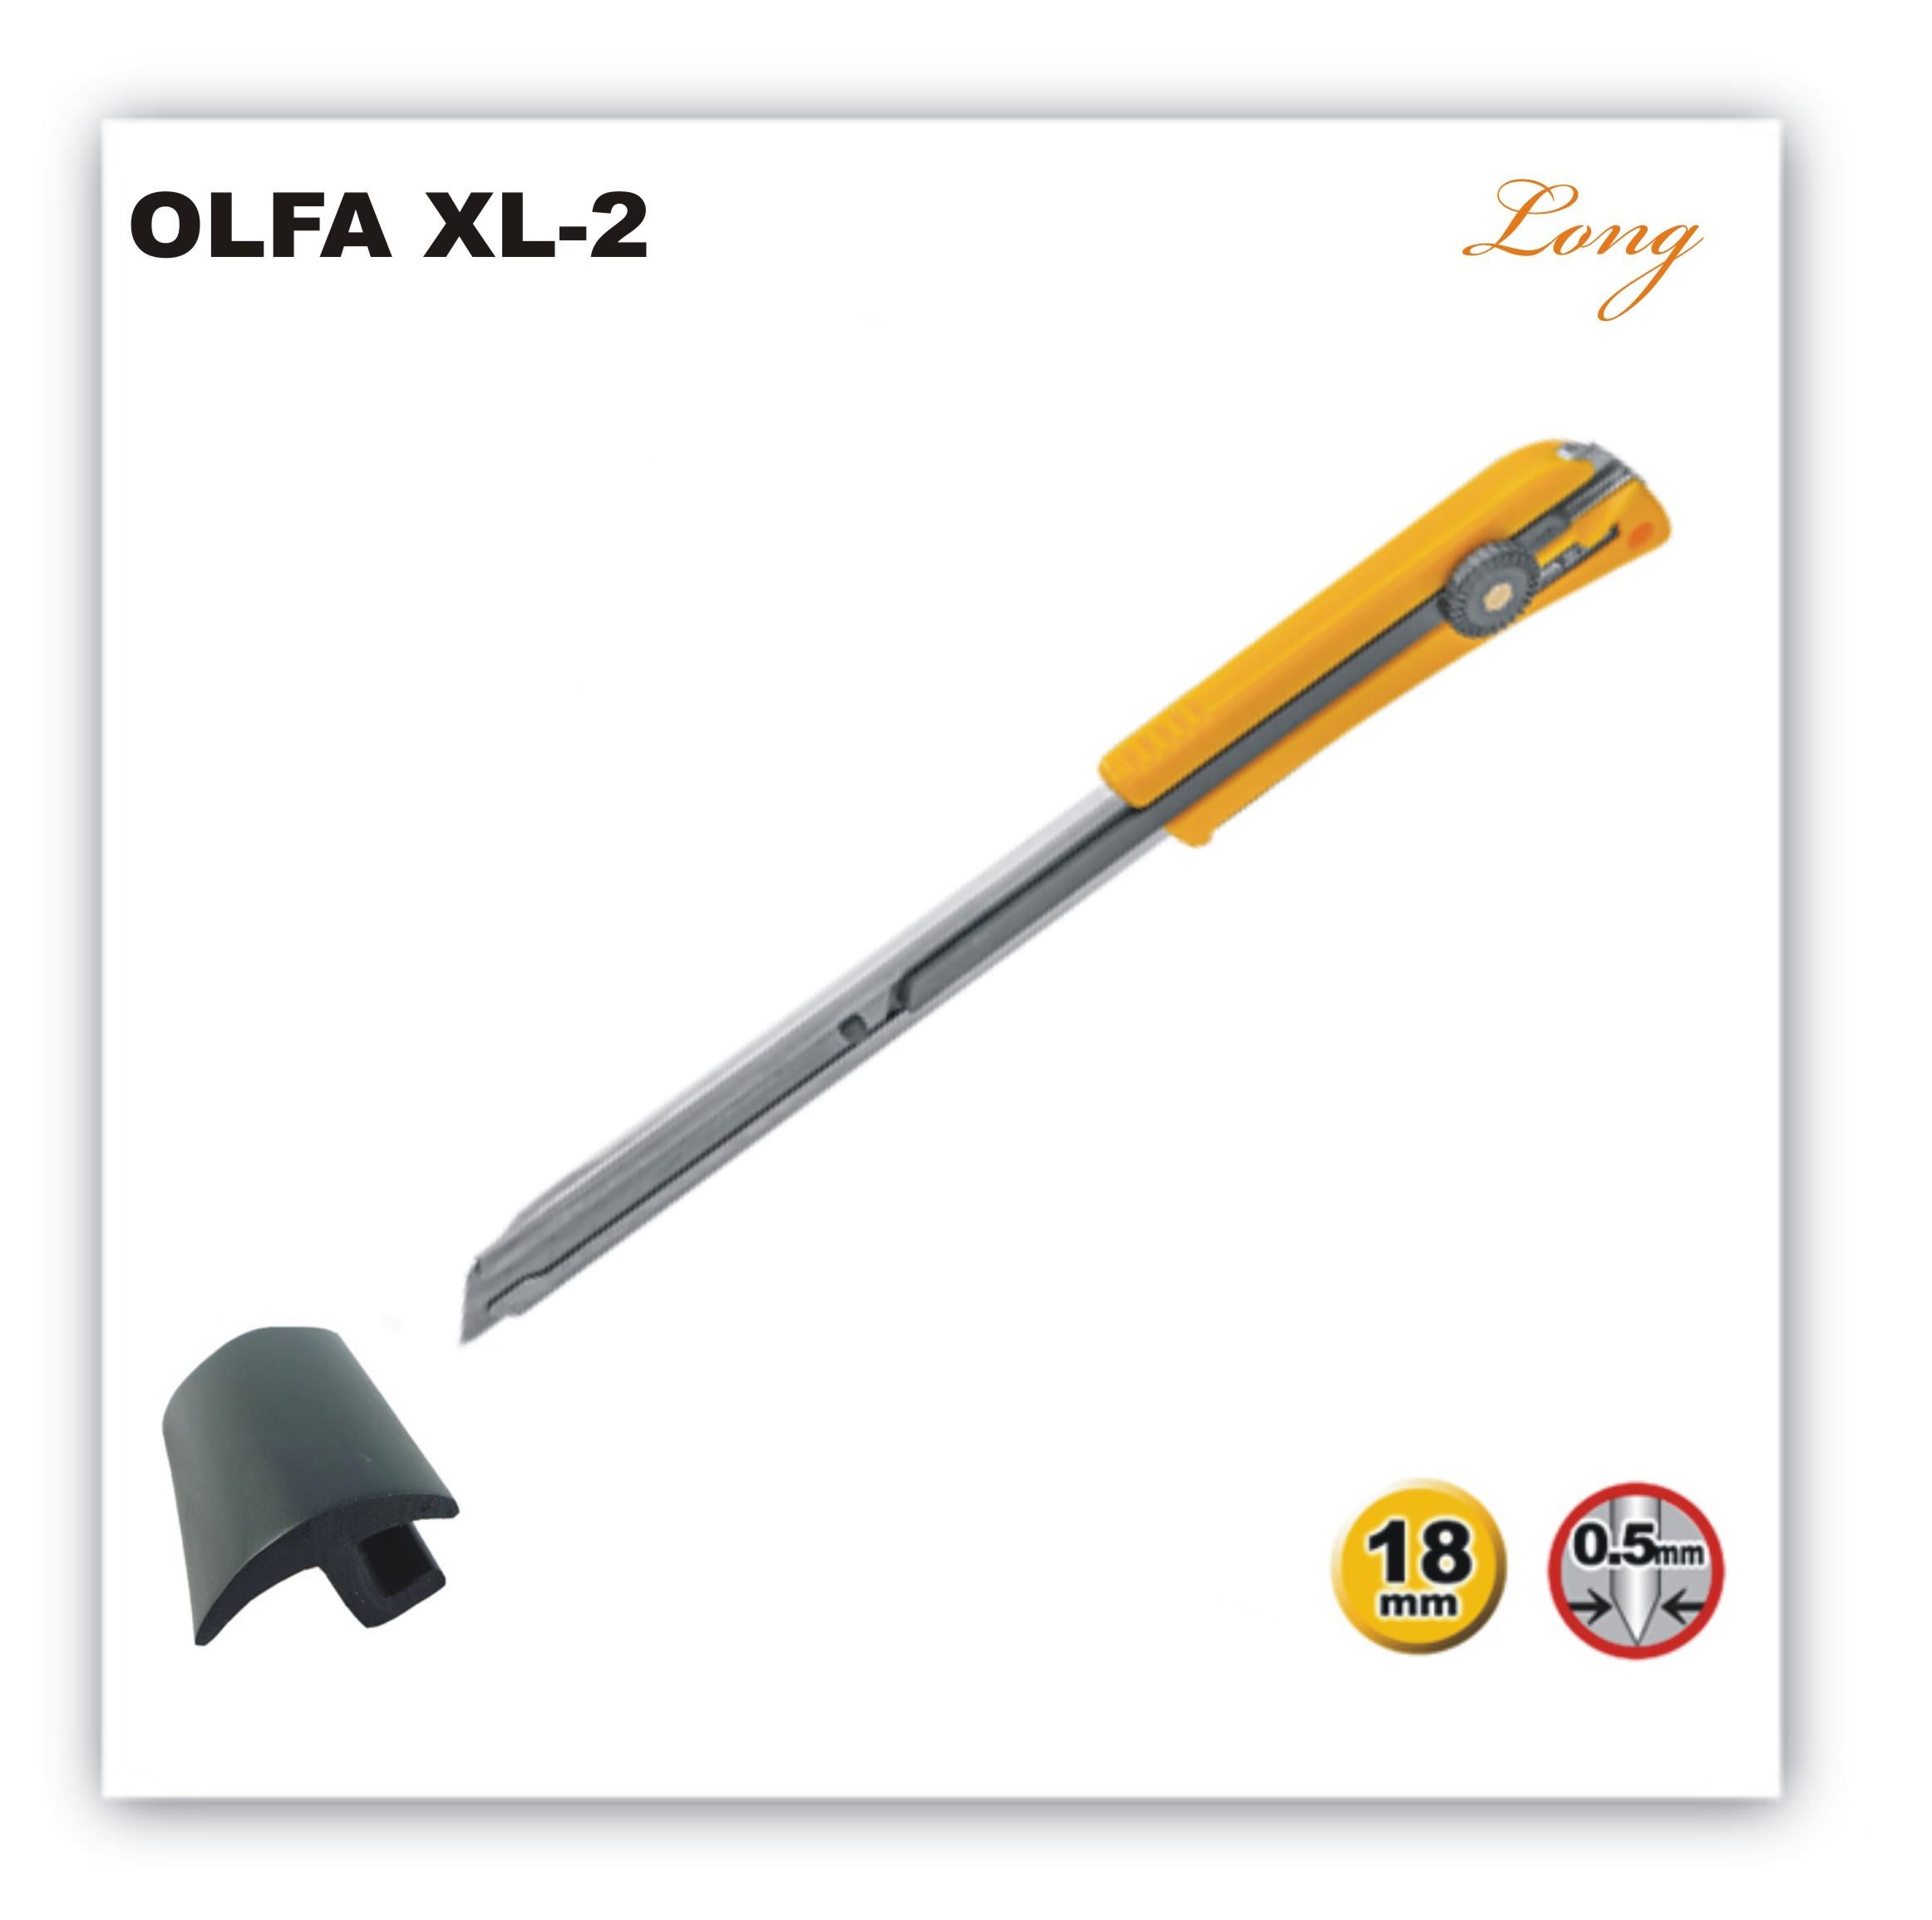 Hosszú Olfa kés - 18 mm -OLFA XL2